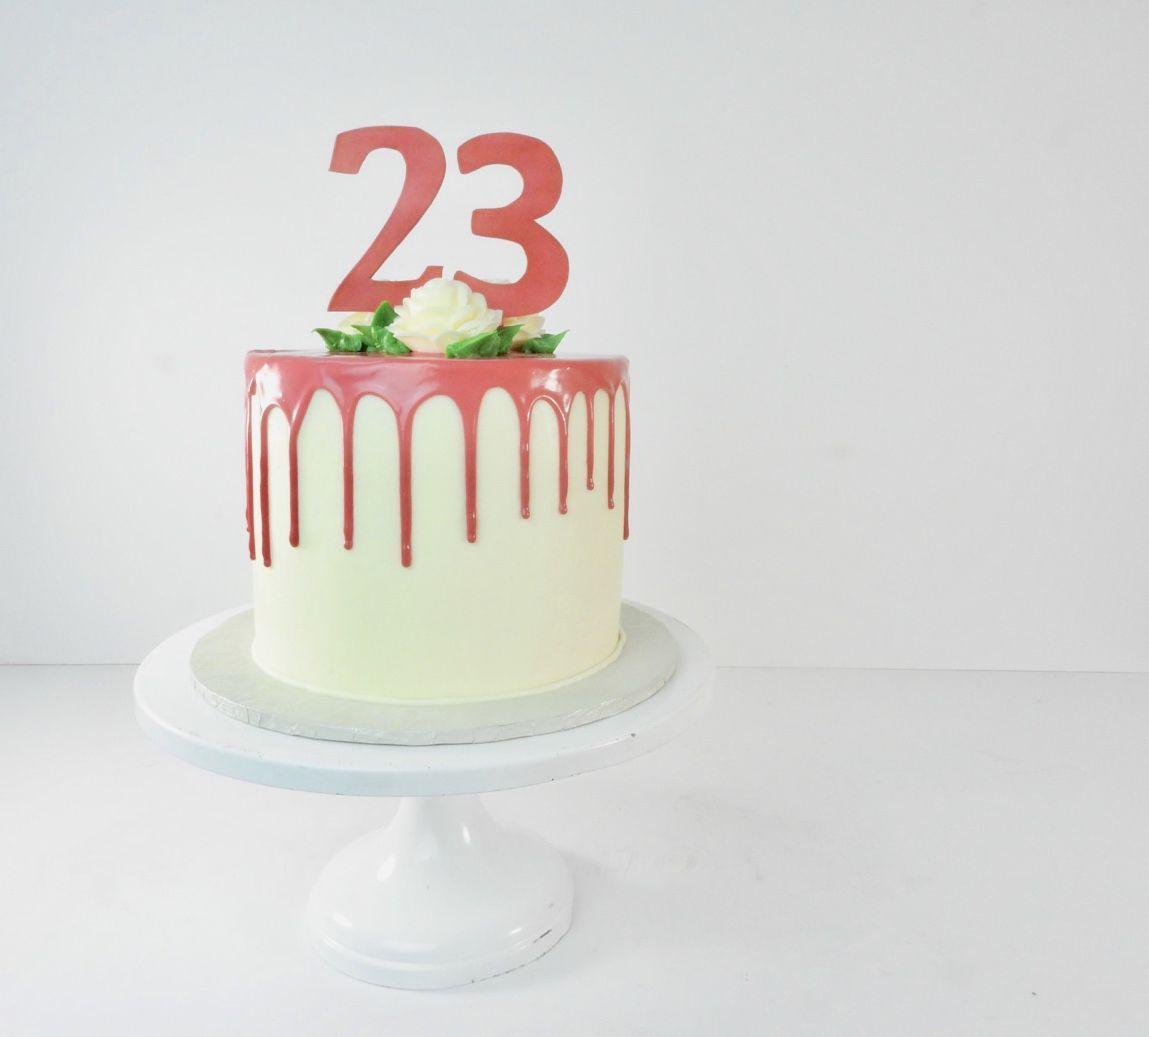 Phenomenal Drop On Point Classic Cake Cake Designs Cake Birthday Cards Printable Inklcafe Filternl